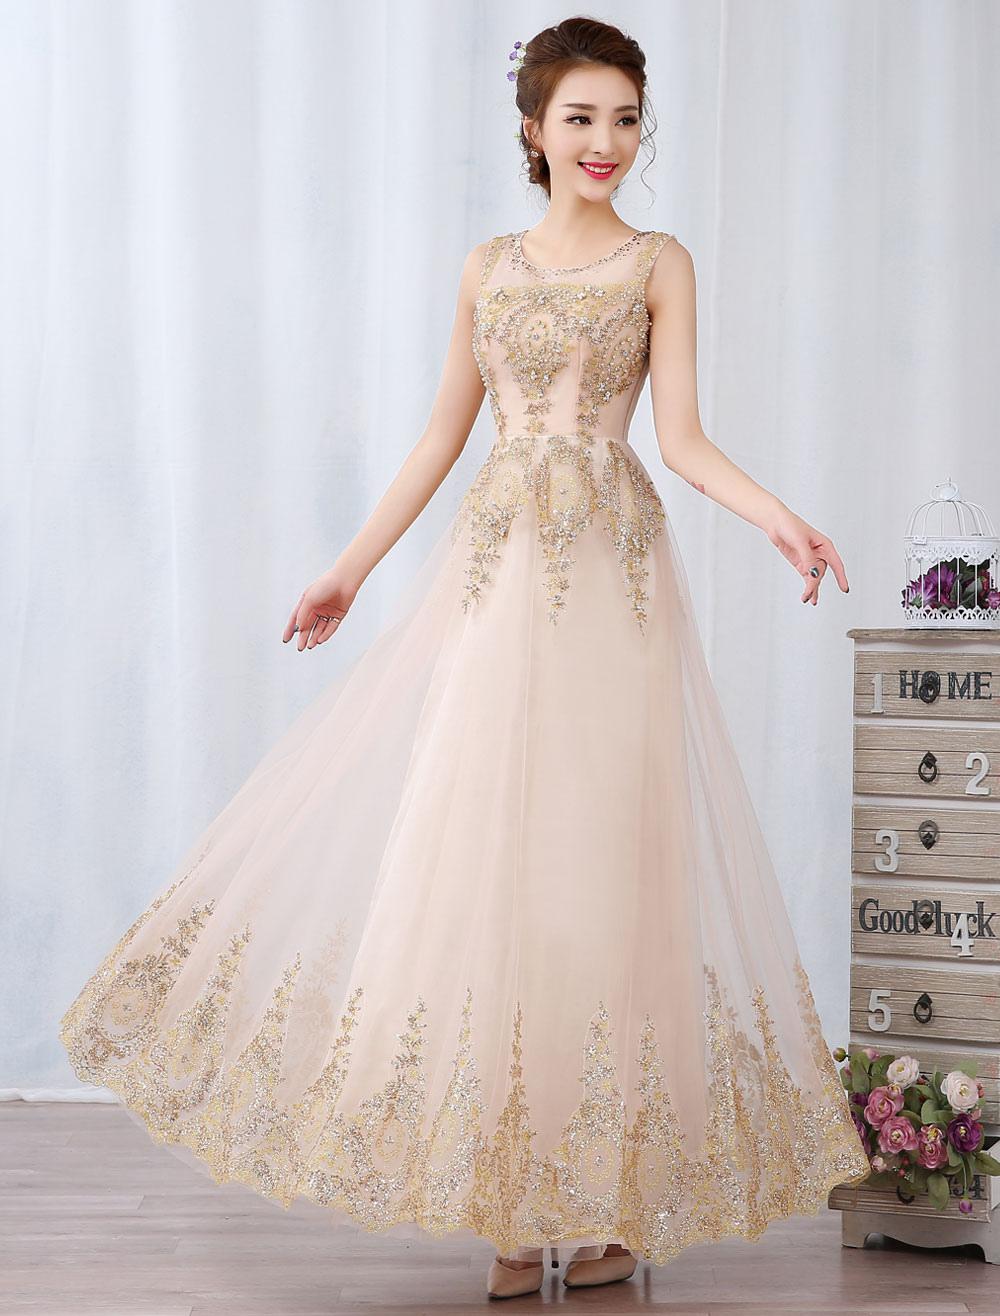 Champagne Prom Dresses Long Rhinestone Beaded Sleeveless Floor Length Formal Occasion Dress (Wedding Cheap Party Dress) photo